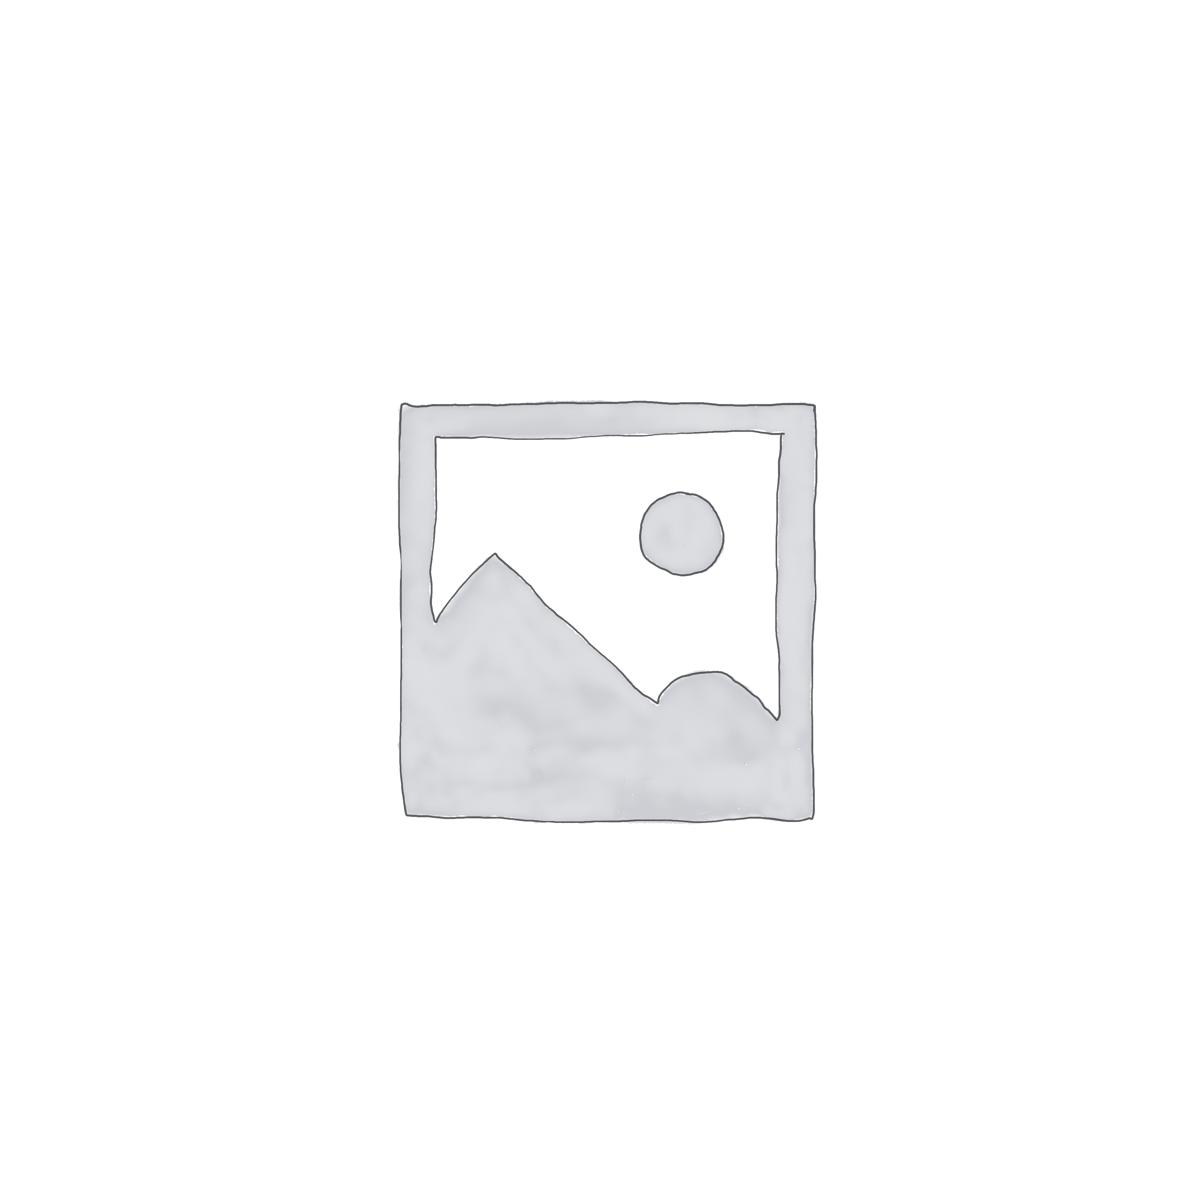 Yellow Floral Art with Horned Deer Wallpaper Mural